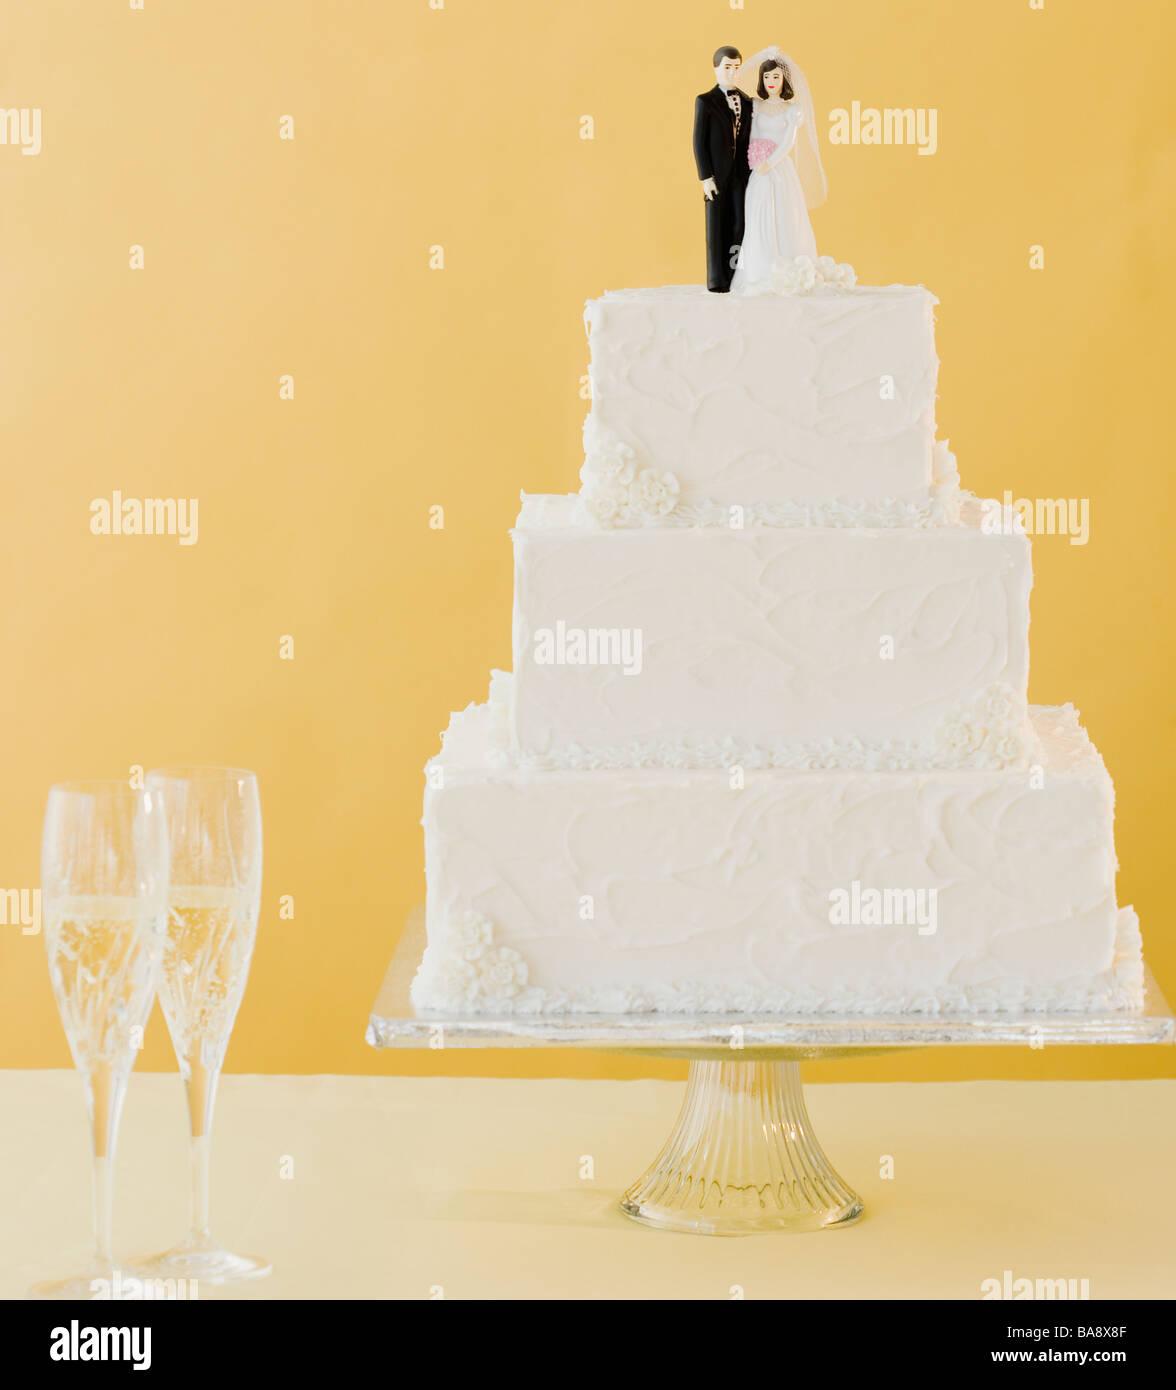 Usa New City Wedding Cake Stock Photos & Usa New City Wedding Cake ...